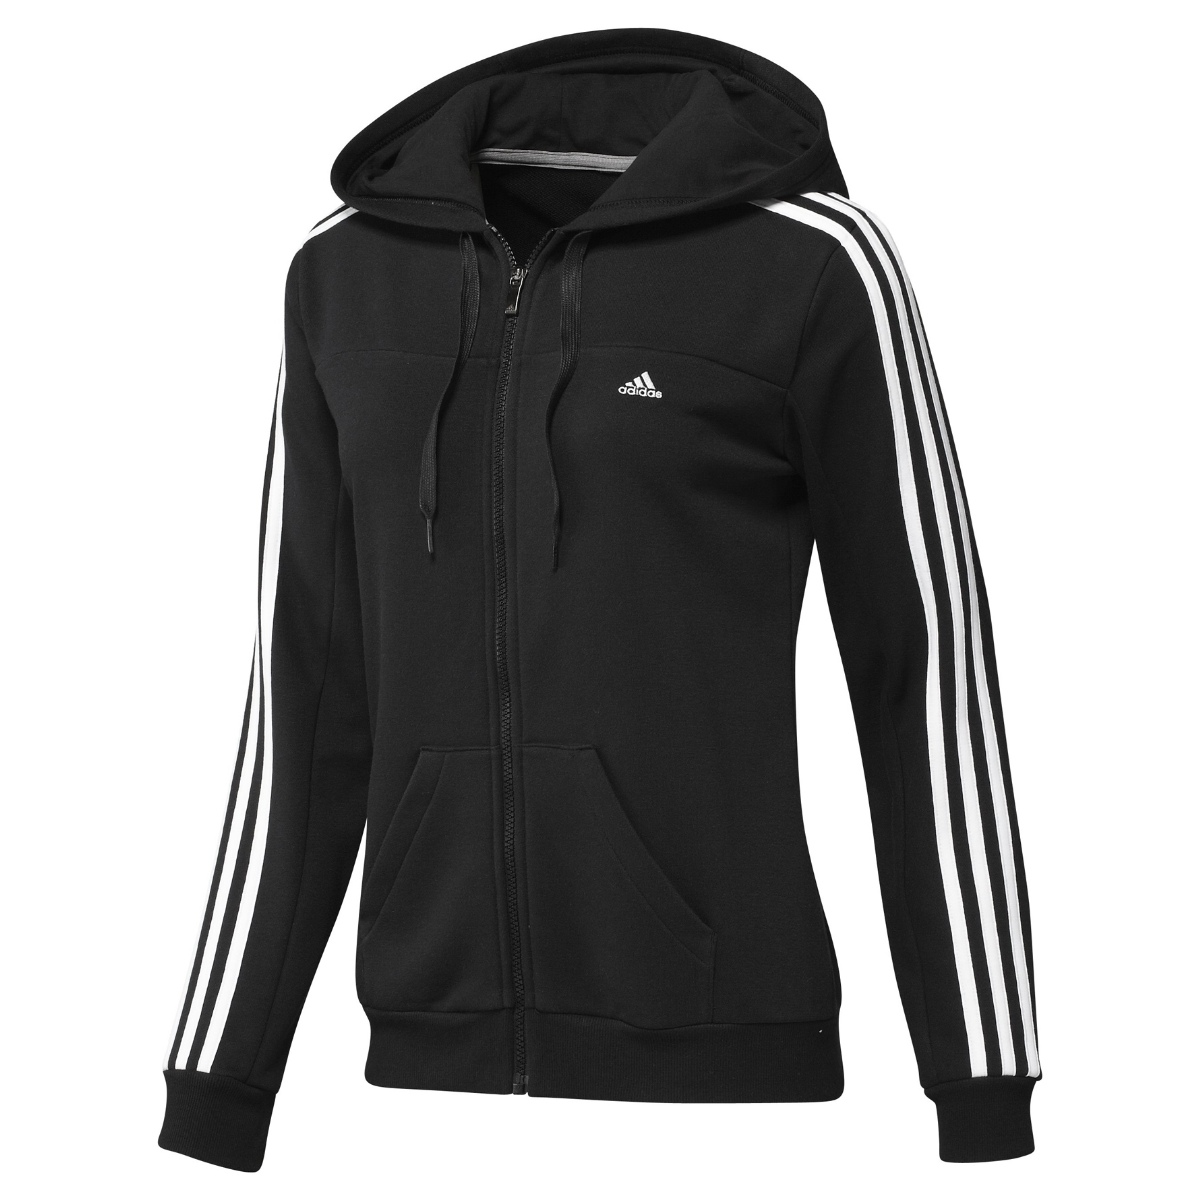 adidas essentials 3s hooded track top schwarz grau damen. Black Bedroom Furniture Sets. Home Design Ideas